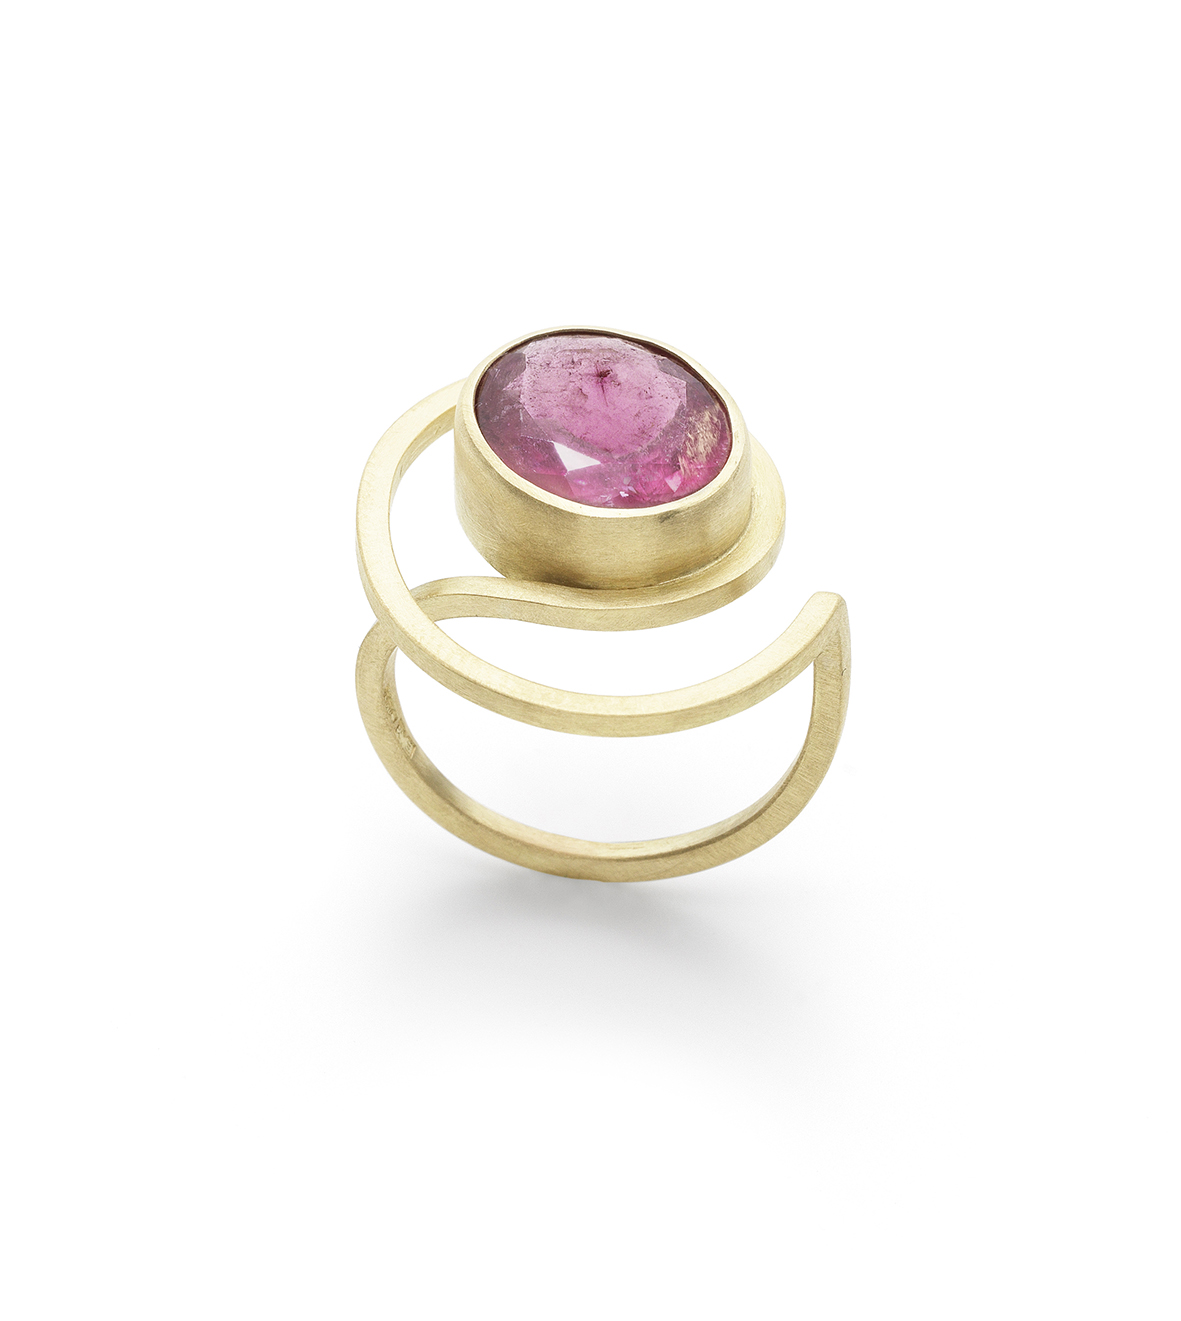 Ellen Monaghan Rubellite Tormaline 18kt gold Curl ring.jpg